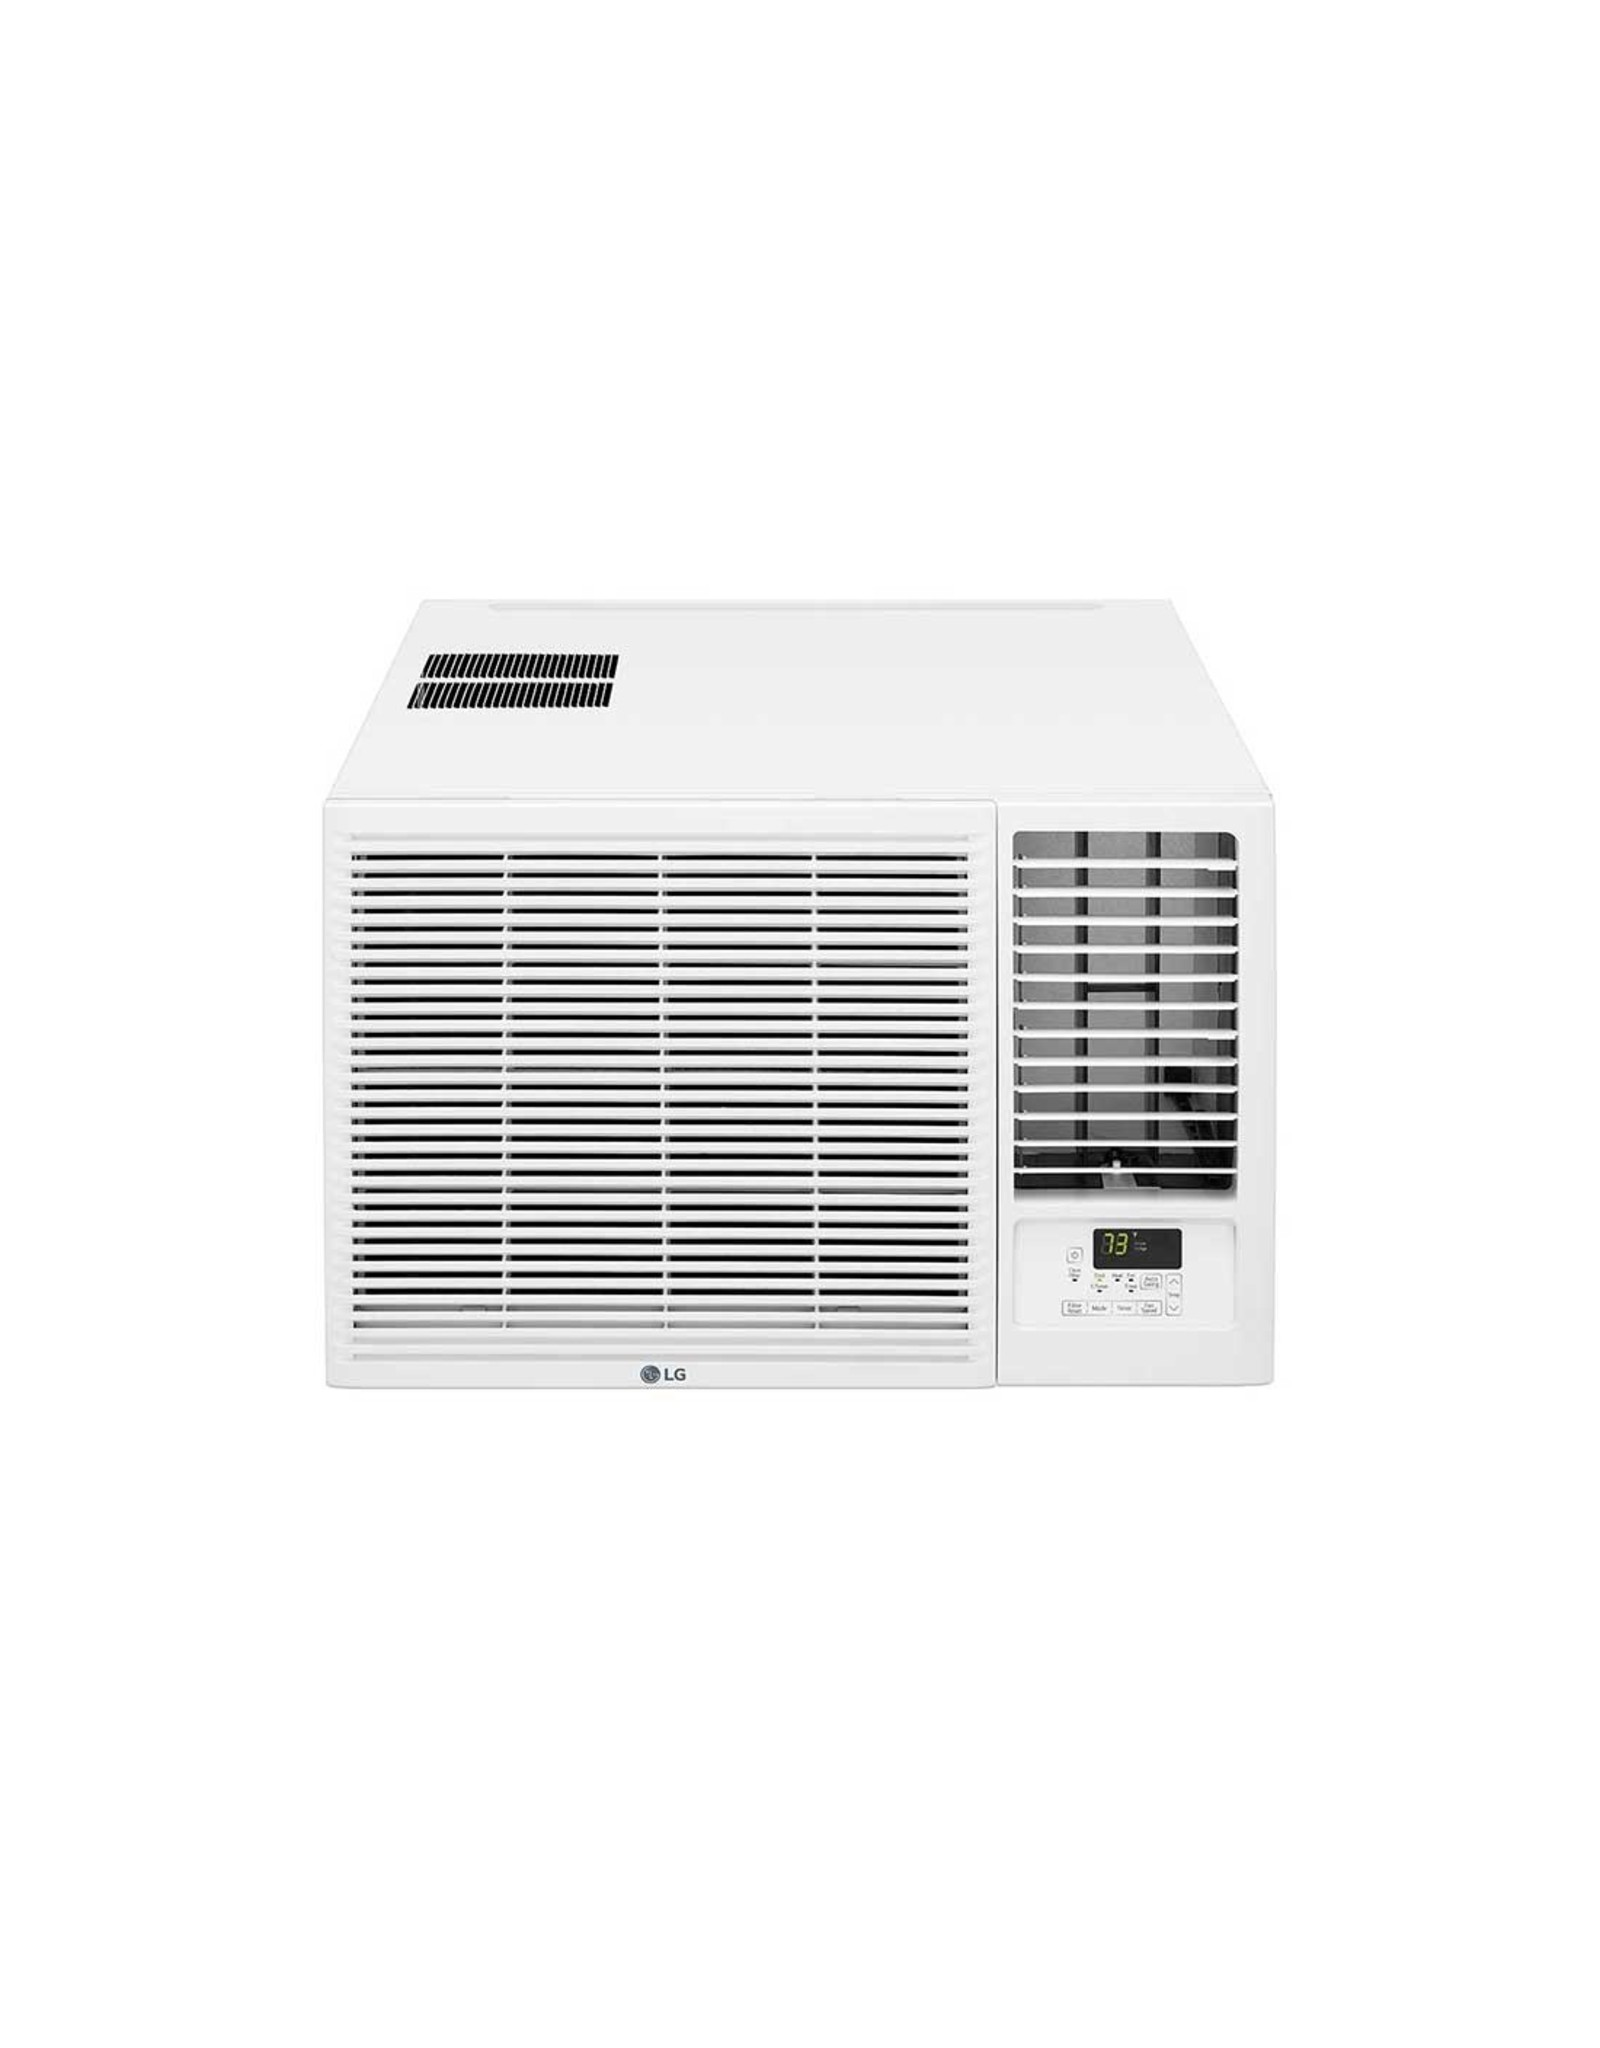 LG Electronics 18,000 BTU Window Air Conditioner, Cooling & Heating